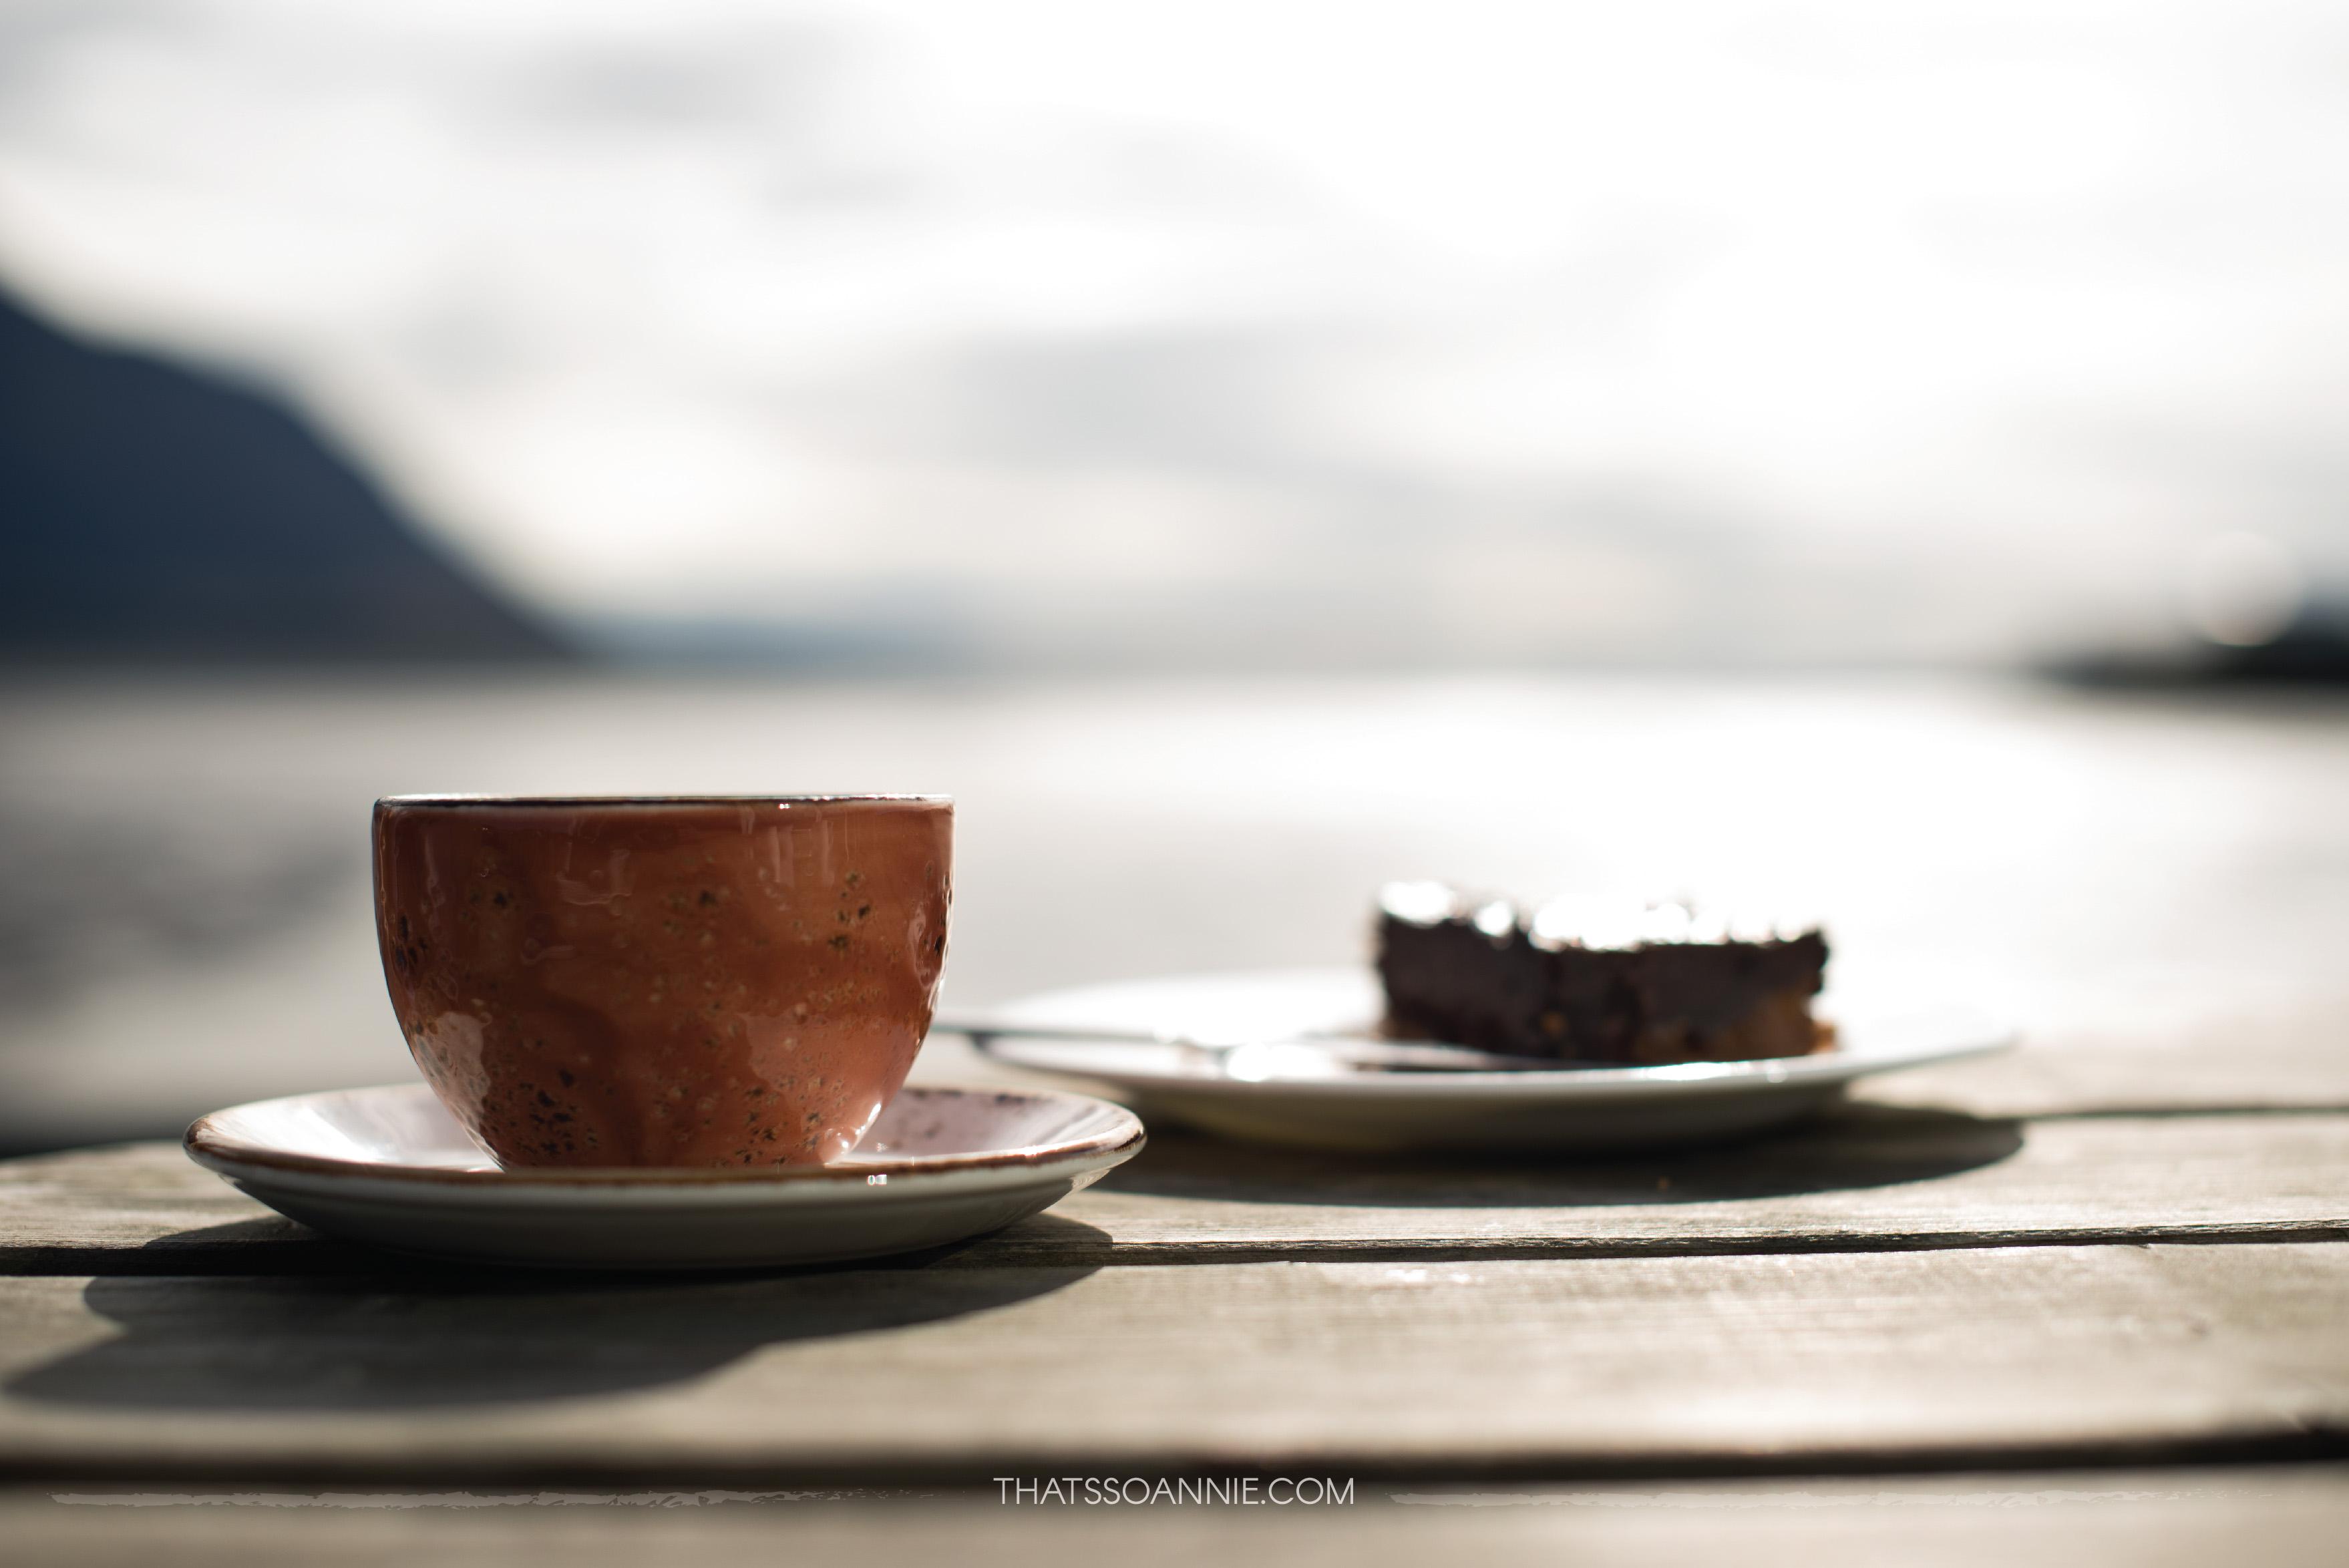 Coffee & Pie @ Geirabakari Kaffihus   Exploring the Snæfellsnes Peninsula, Iceland   www.thatssoannie.com